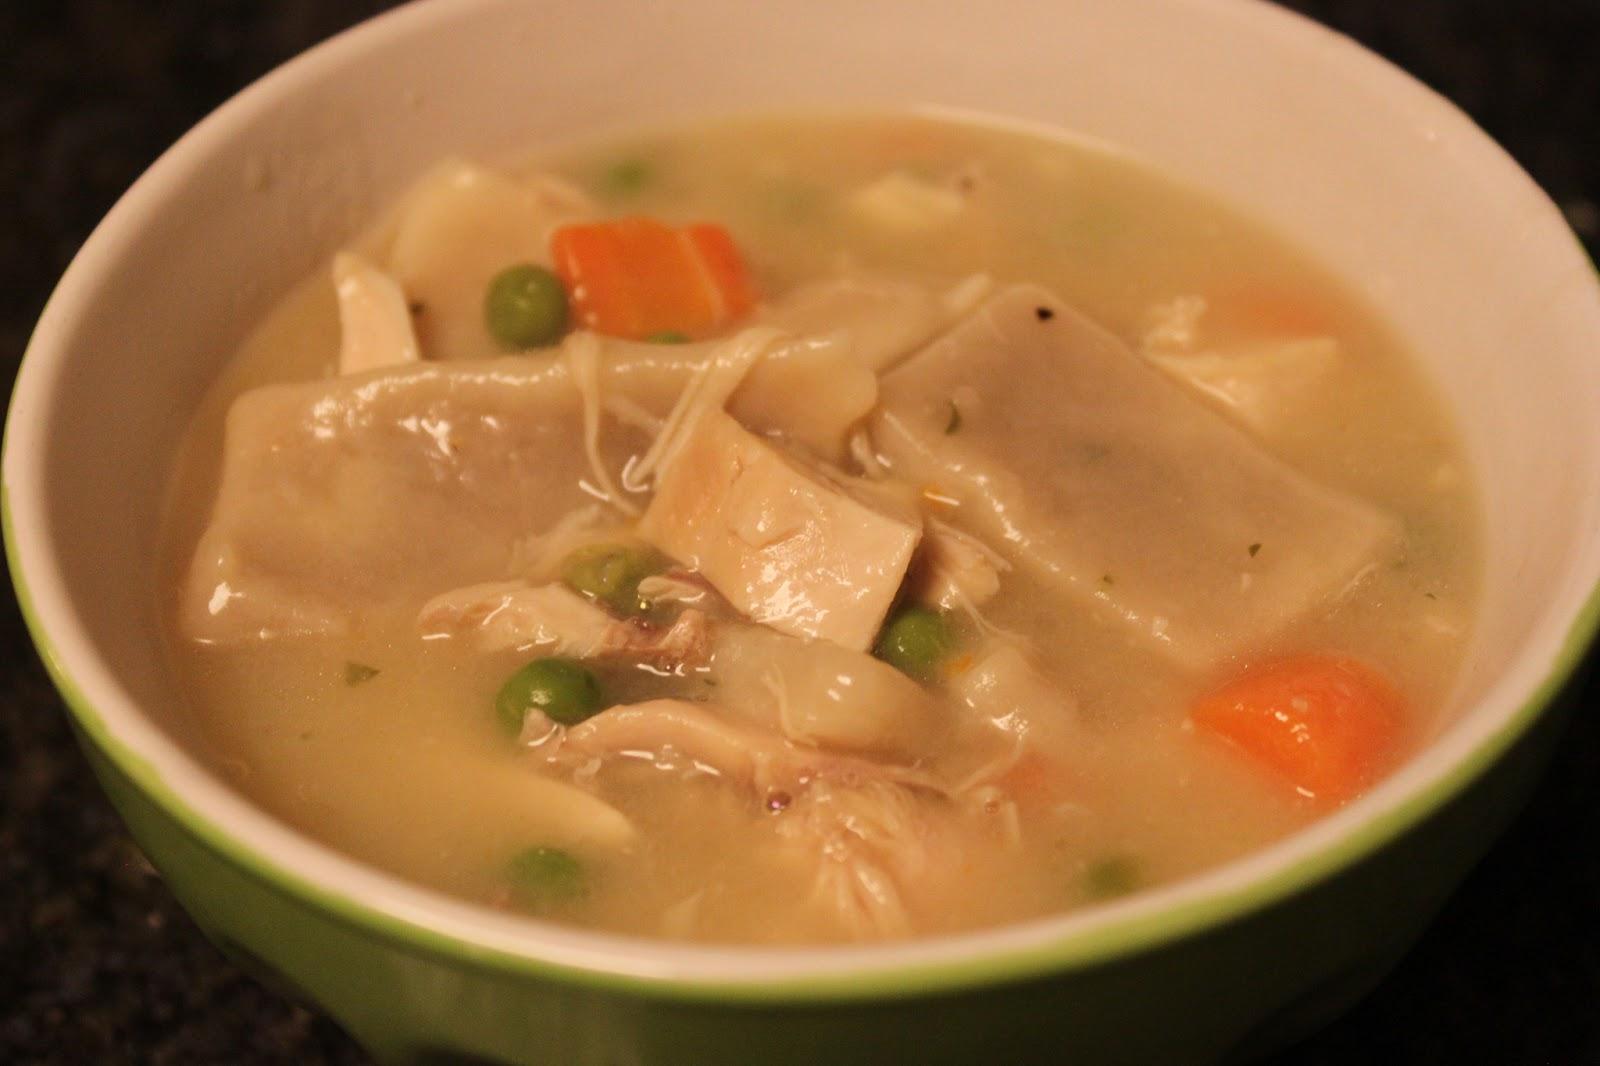 Megsiemay Makes: Southern Chicken & Dumplings